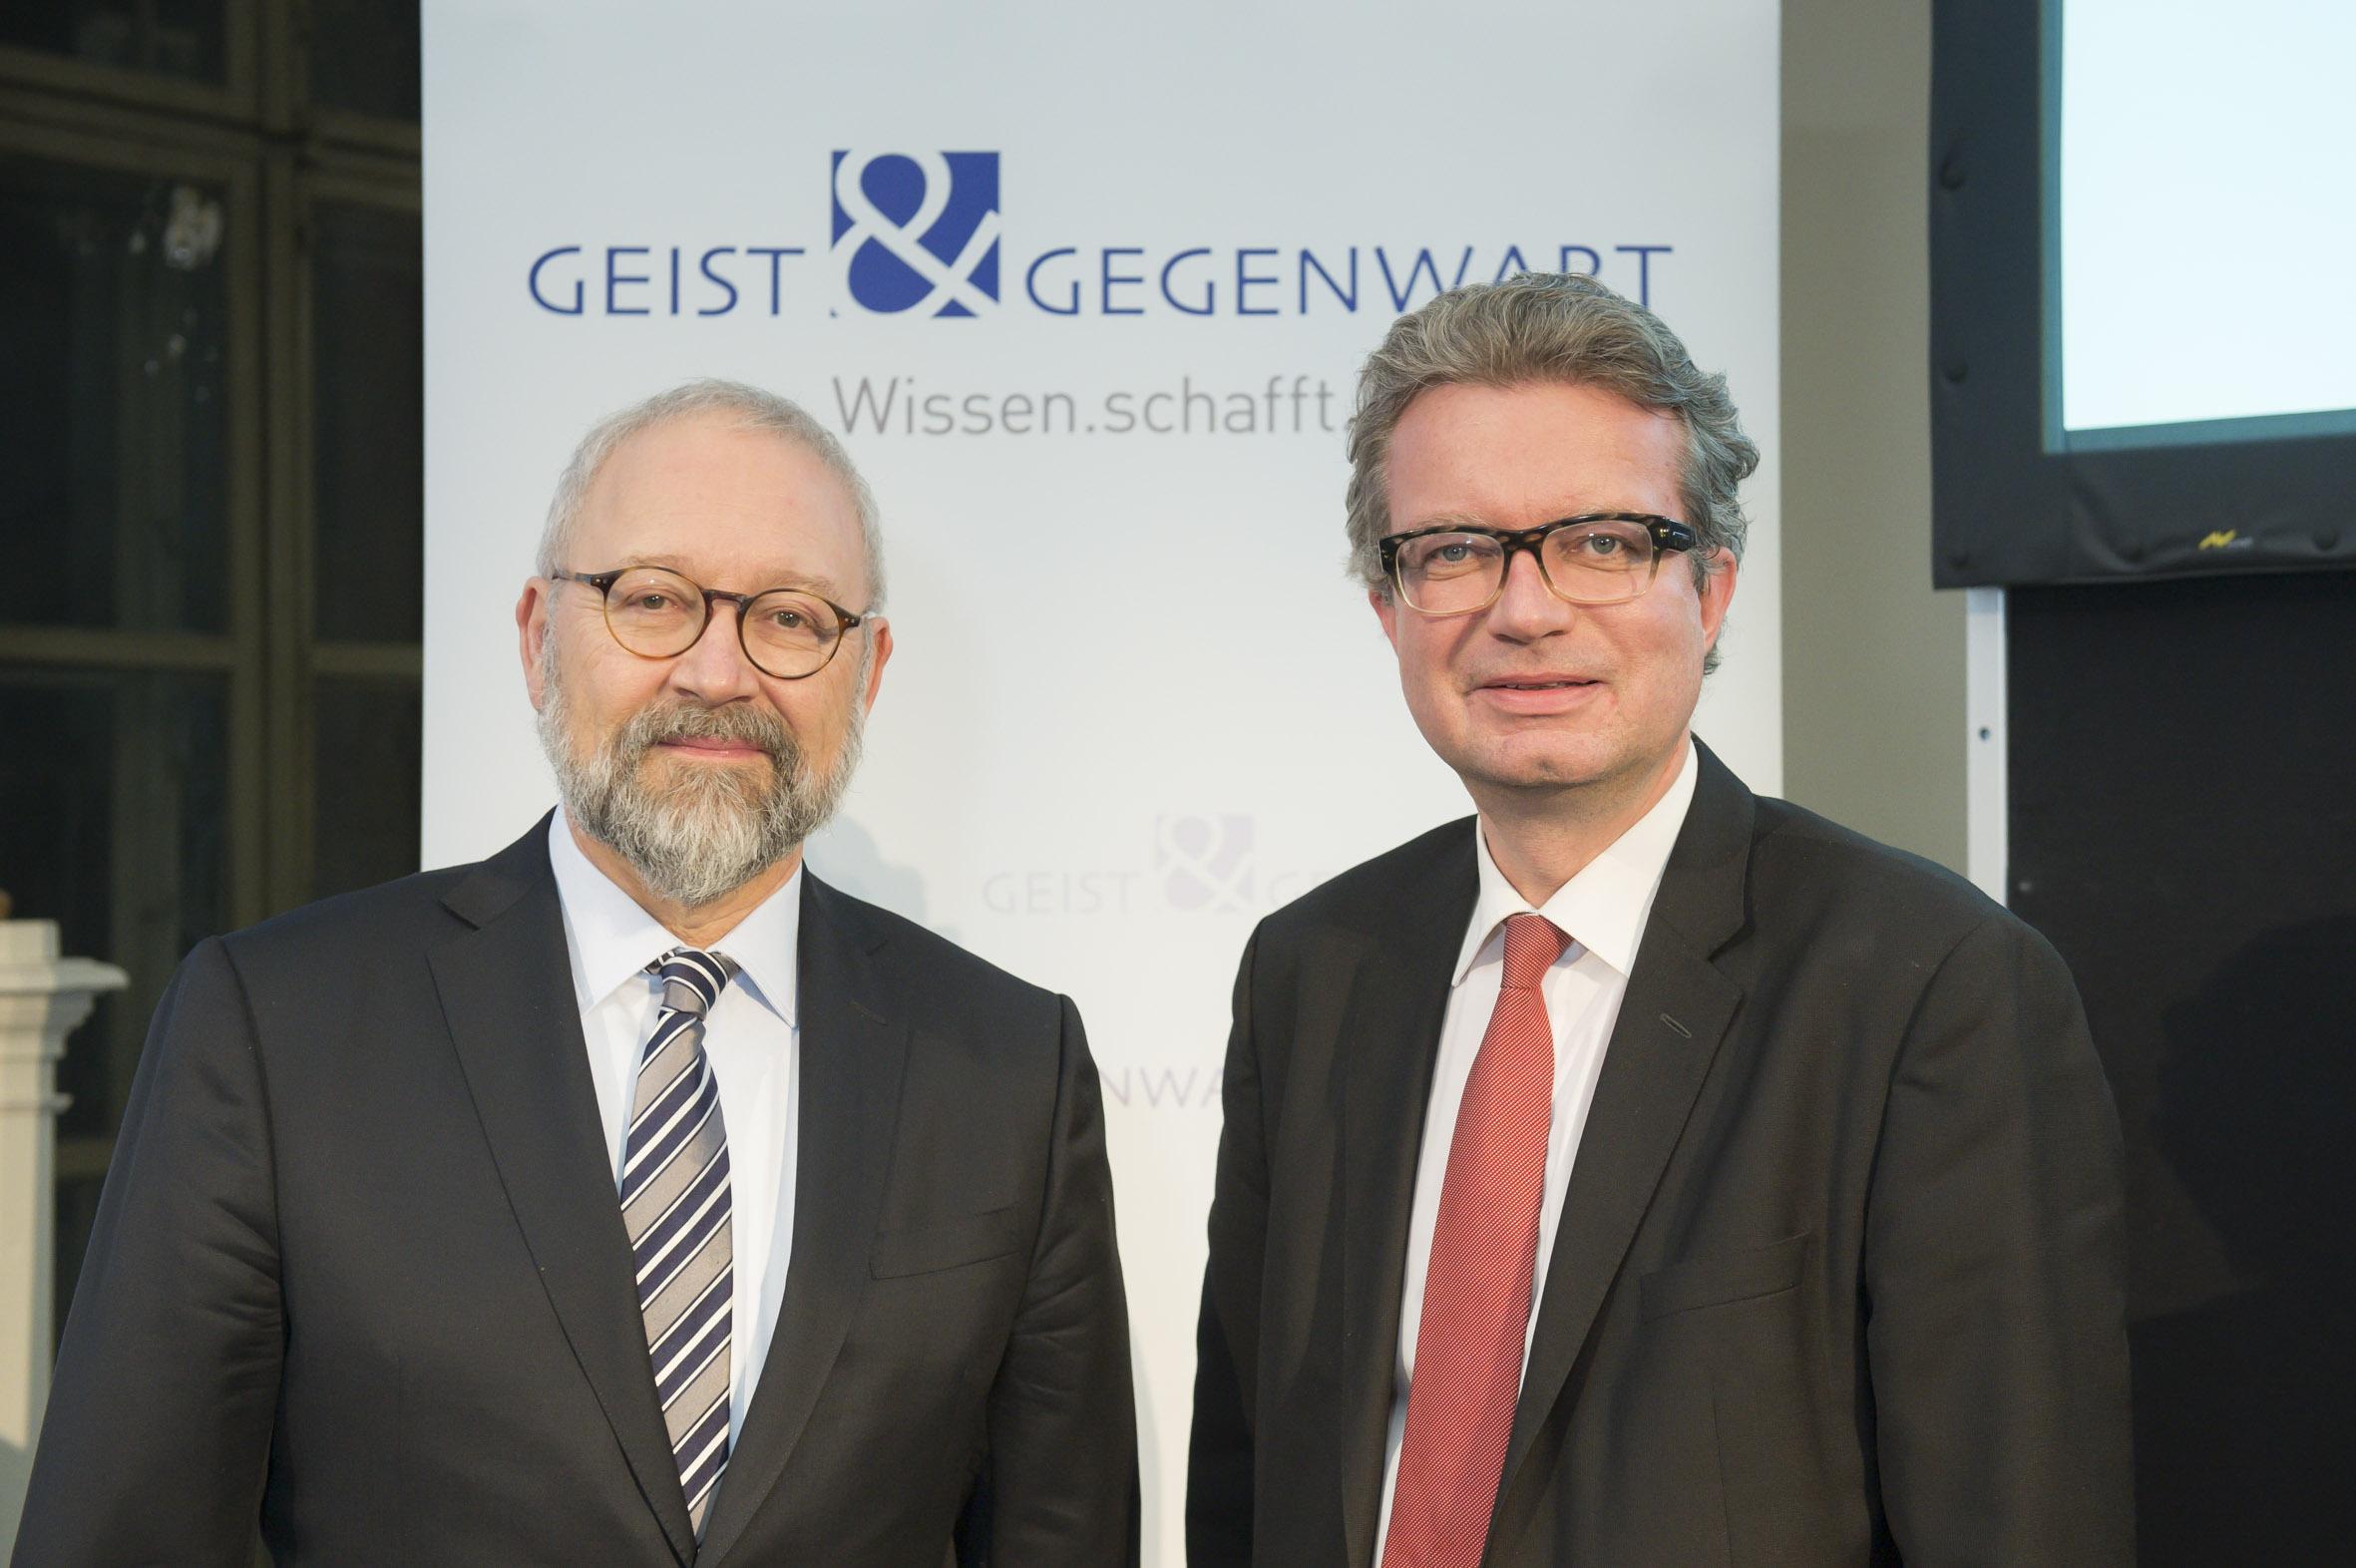 Geist_Gegenwart_Muenkler am 13.03.2017 copyright by Foto Fischer, Herrengasse 7 ( Altstadtpassage ),  8010 Graz, Tel.: 0043/ 316/ 82 53 22,  Fax DW4, e-mail :